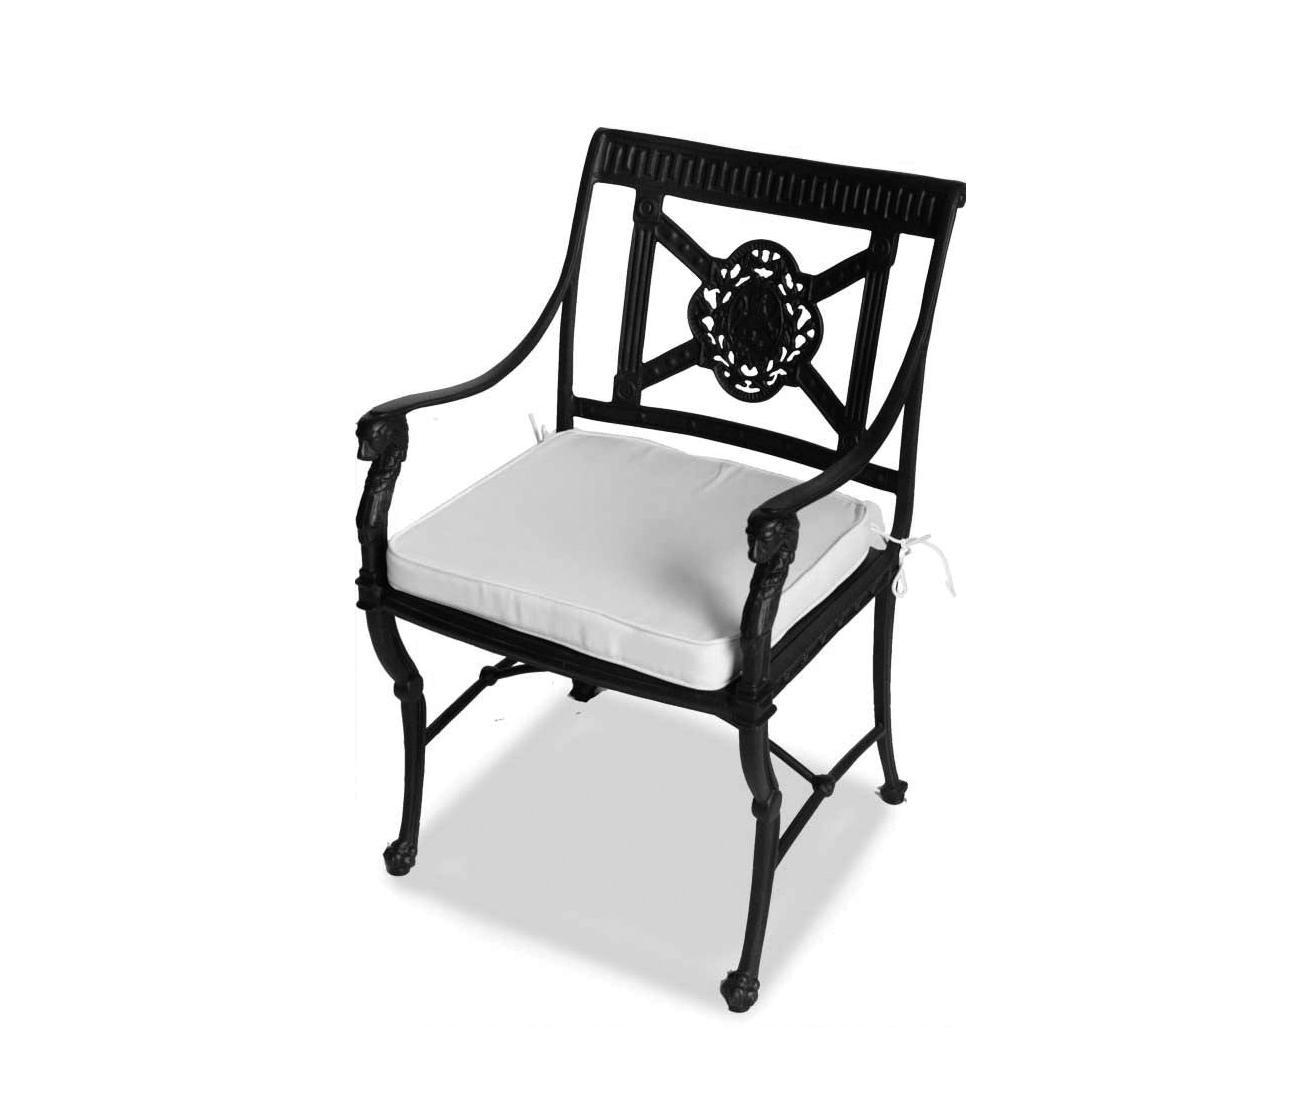 Luxor Armchair By Oxleyu0027s Furniture | Garden Chairs